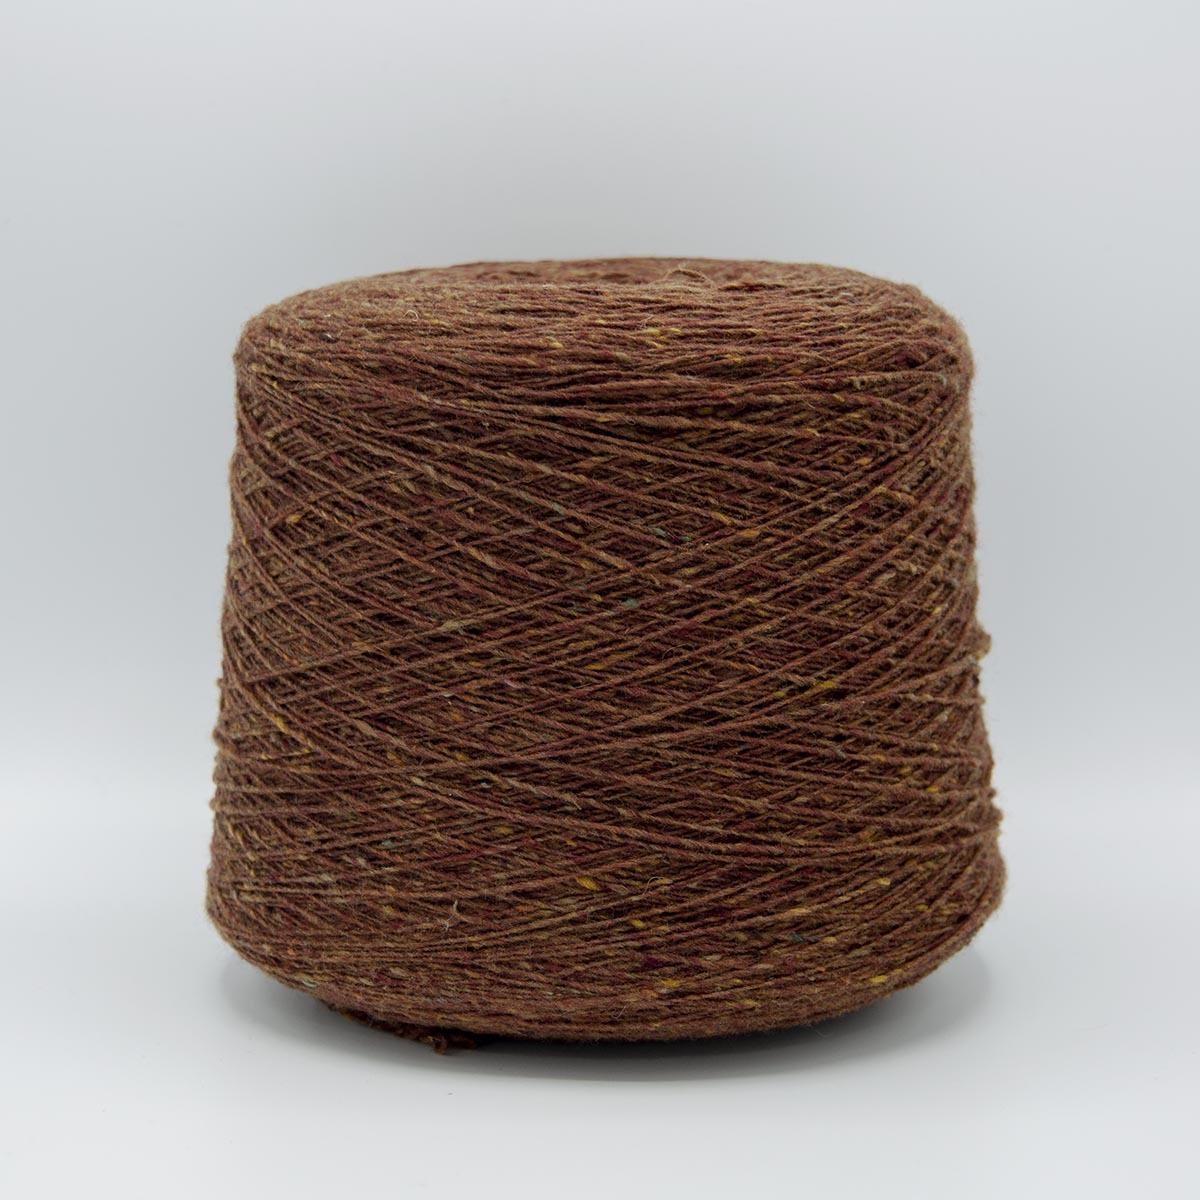 Knoll Yarns Soft Donegal (одинарный твид) - 5549